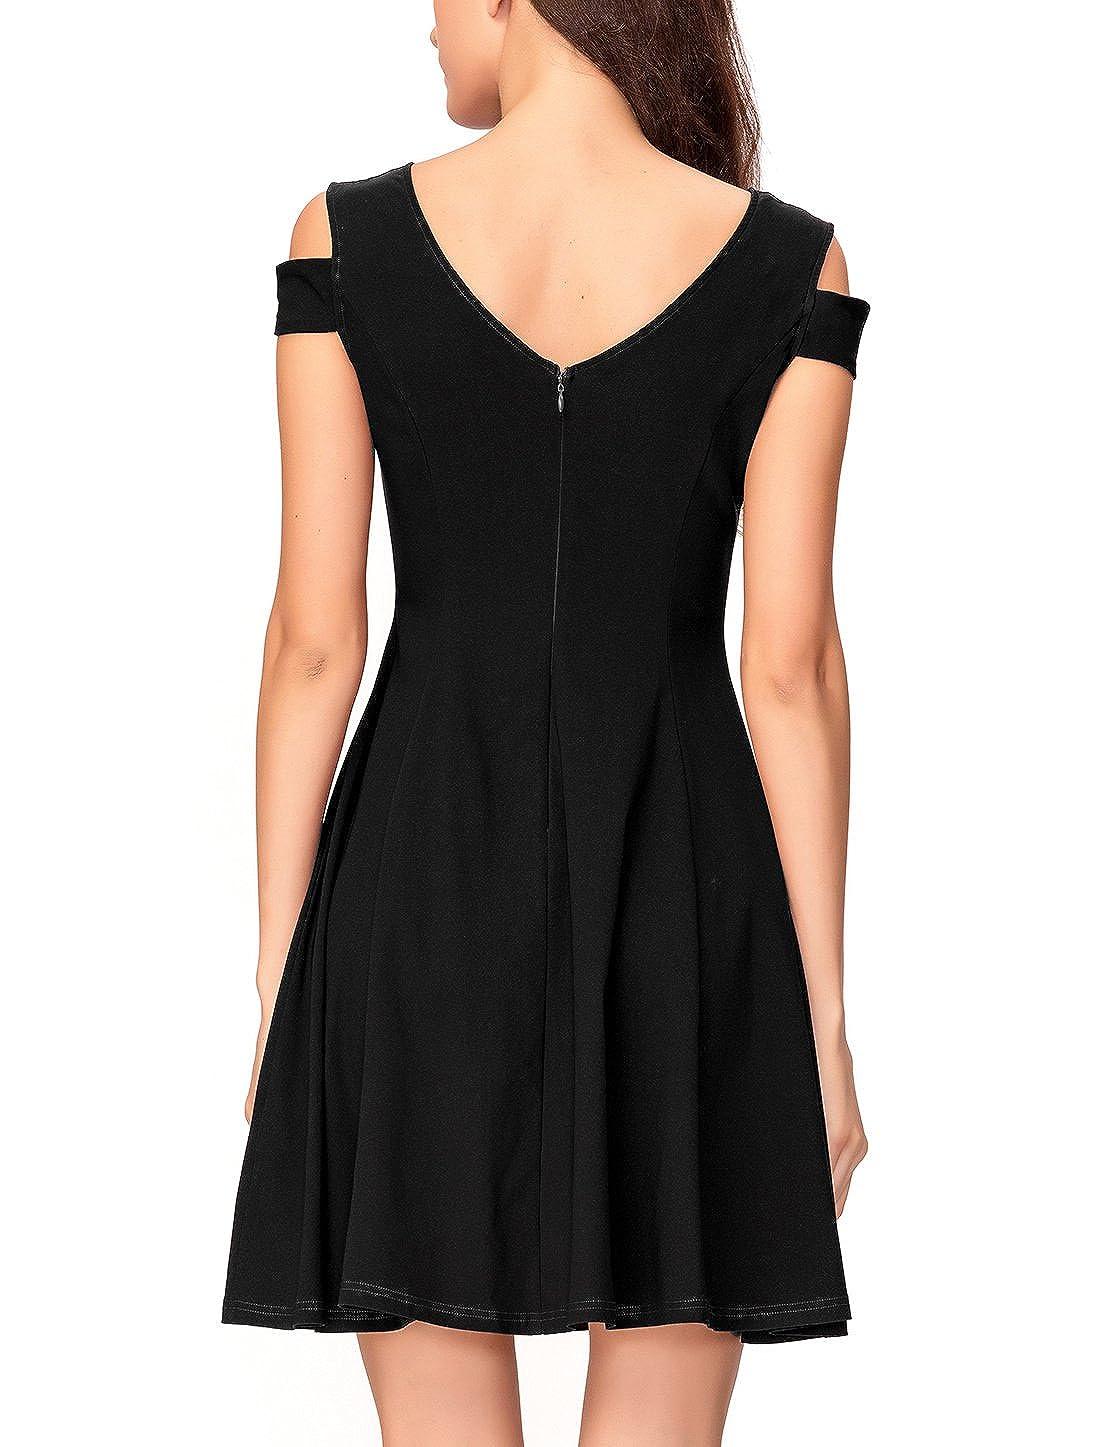 2325848bc4e6 Amazon.com: InsNova Summer Vintage Cold Shoulder Flare Little Black Dress  for Women Party: Clothing